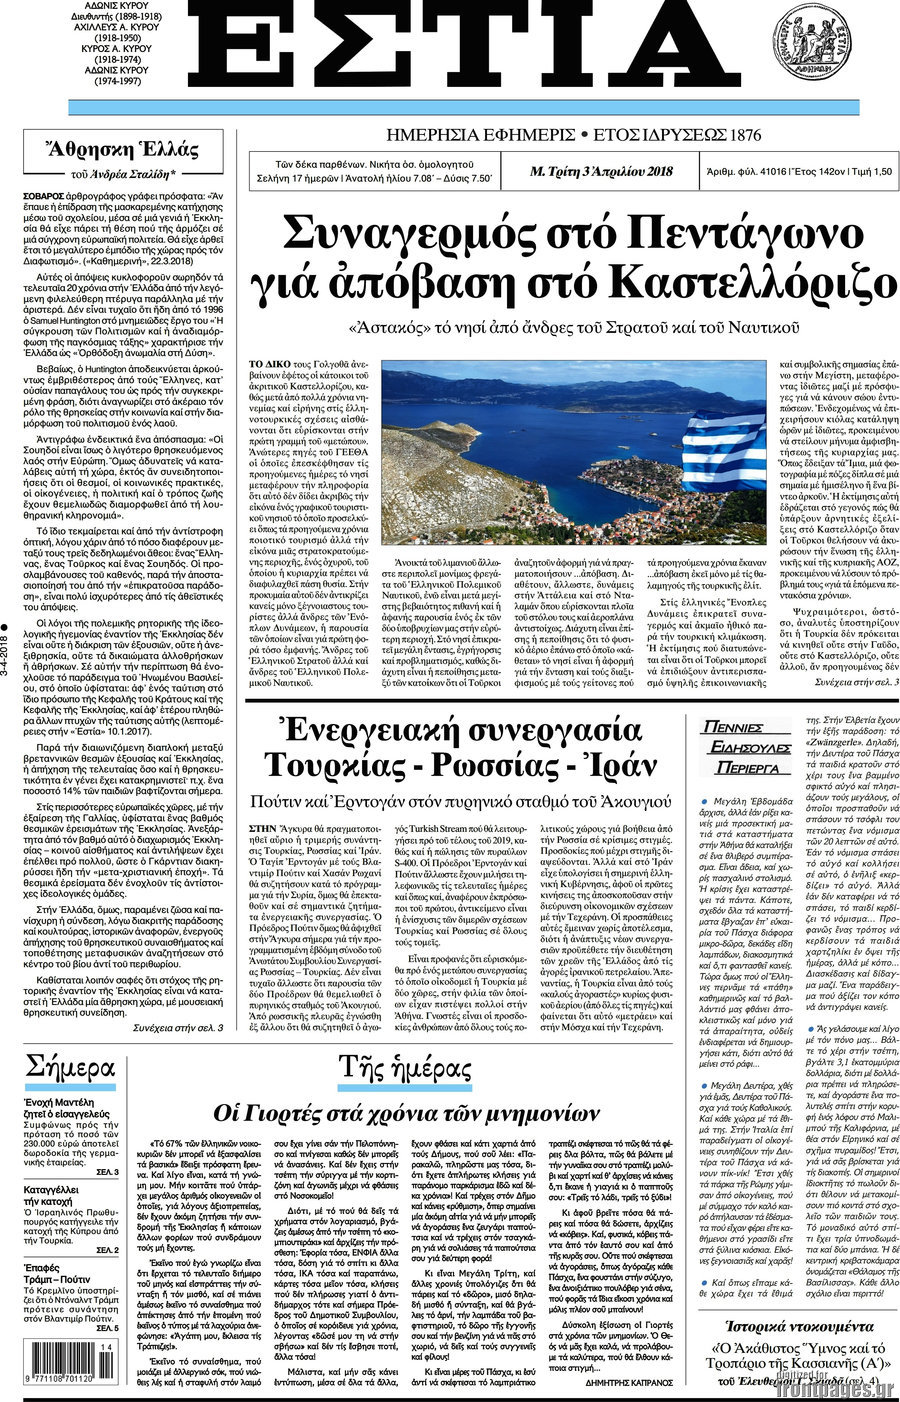 https://www.frontpages.gr/data/2018/20180403/EstiaI.jpg